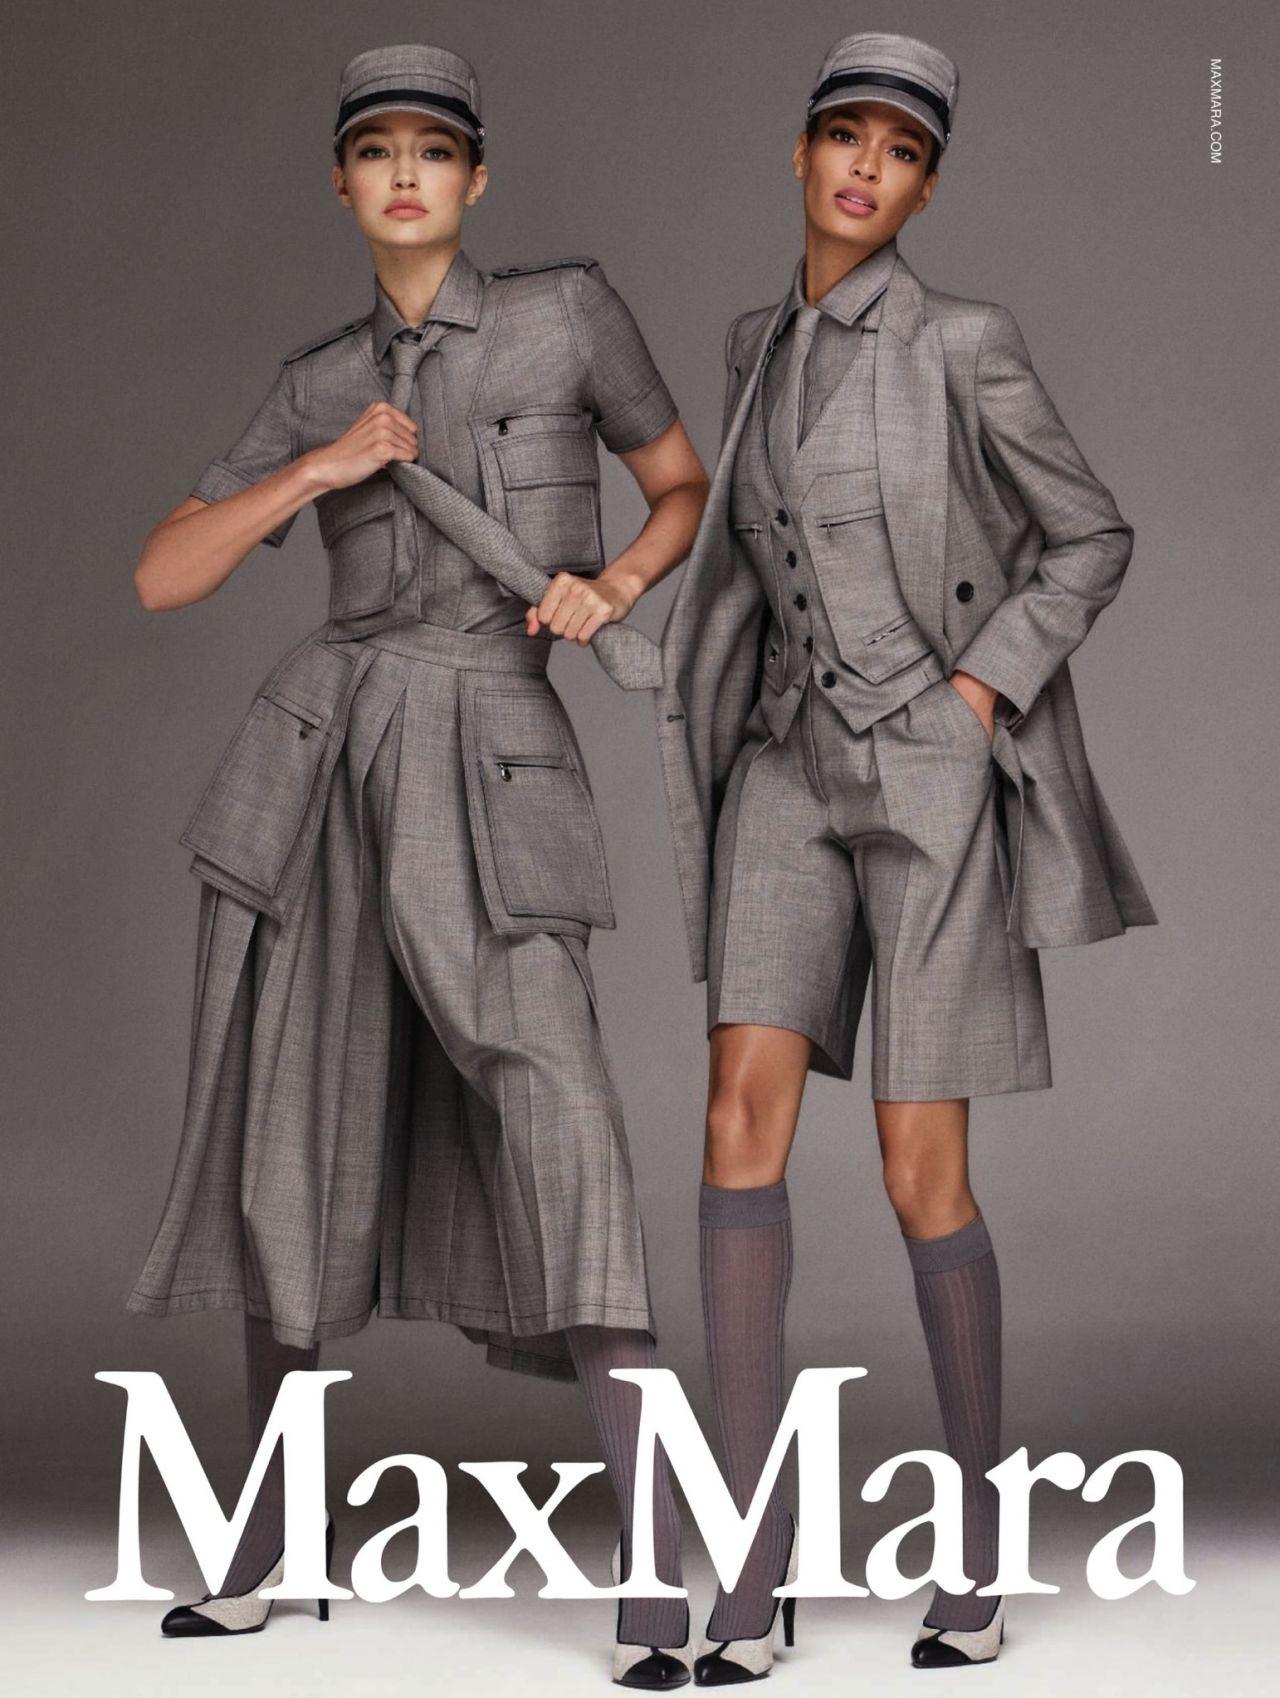 gigi-hadid-joan-smalls-stars-in-max-maras-spring-summer-2020-campaign